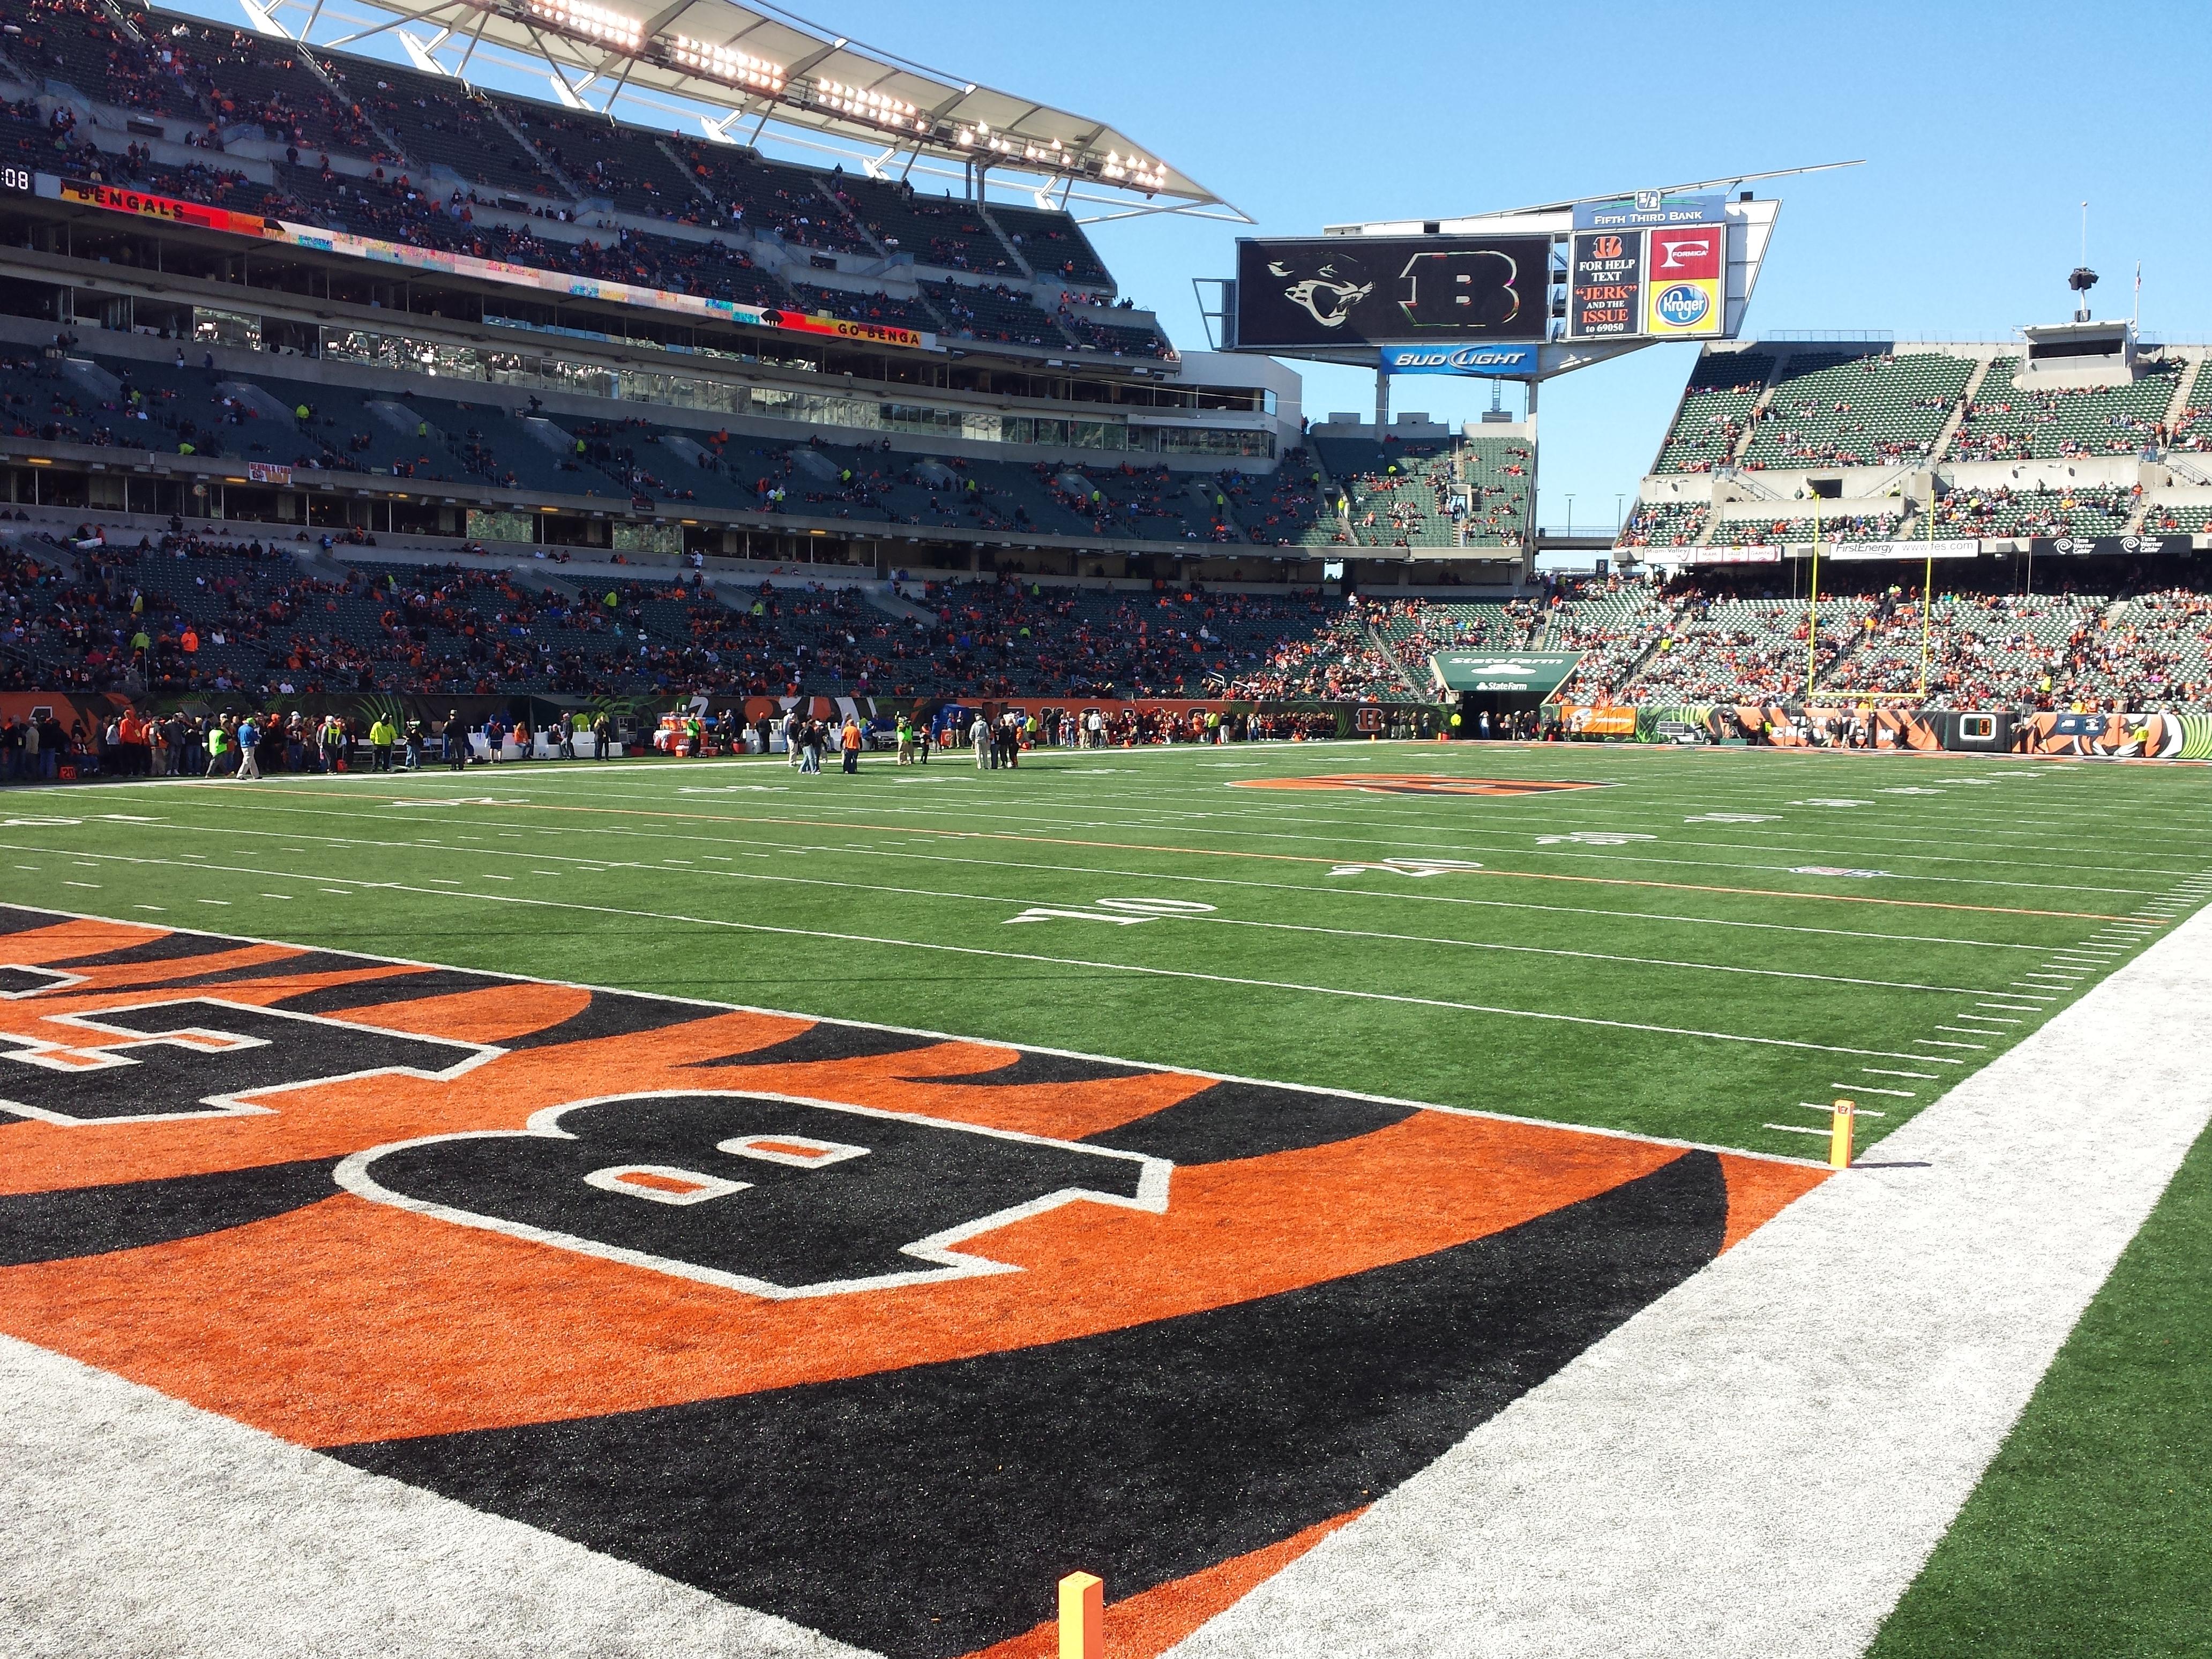 [NFL] Week 9: Battaglia felina, le tigri hanno la meglio (Jacksonville Jaguars vs Cincinnati Bengals 23-33)